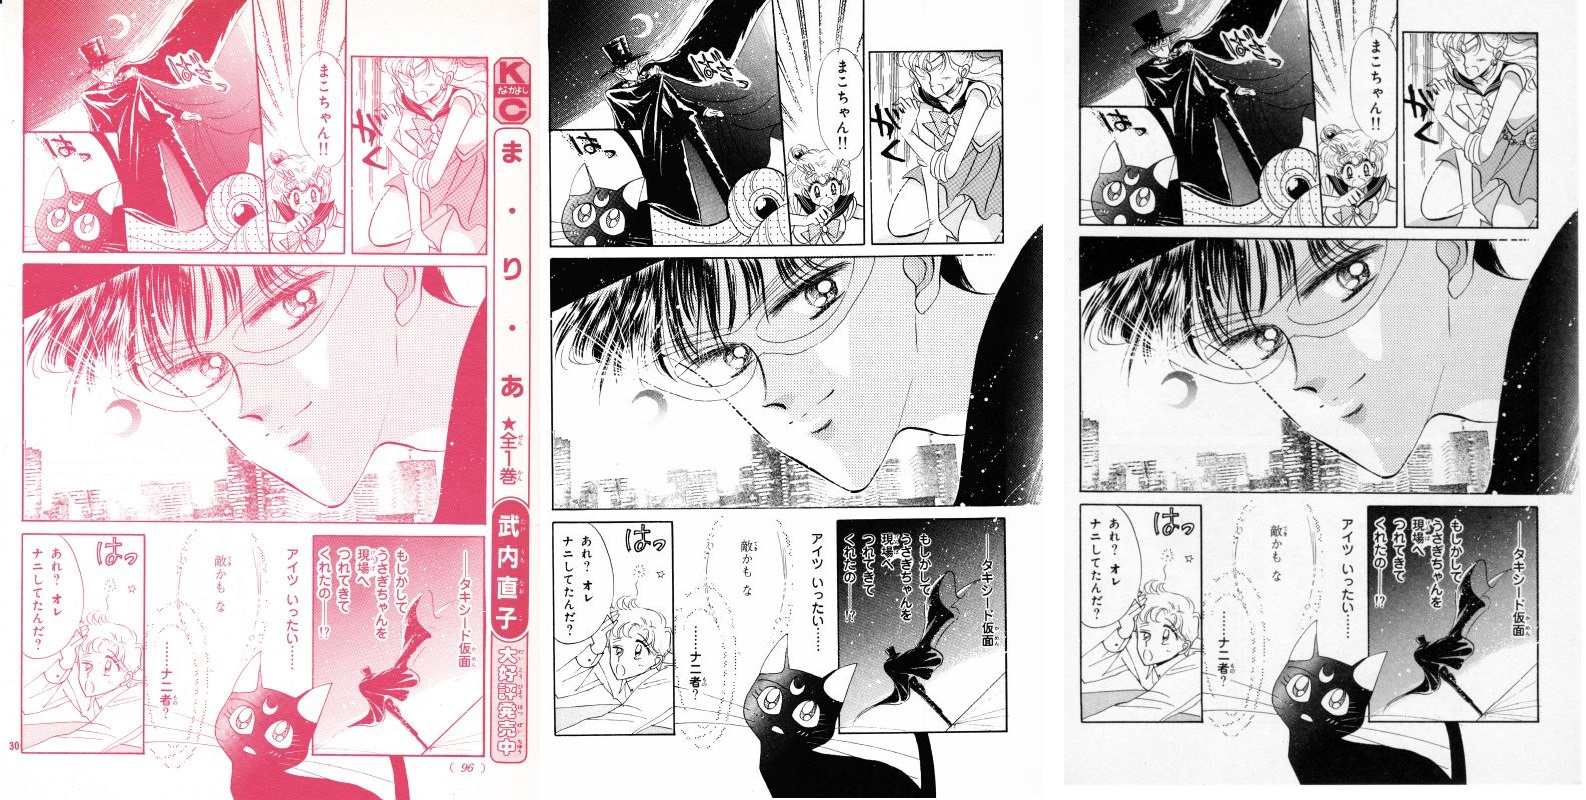 Act 5, Page 28 – Nakayoshi, Original, Remaster